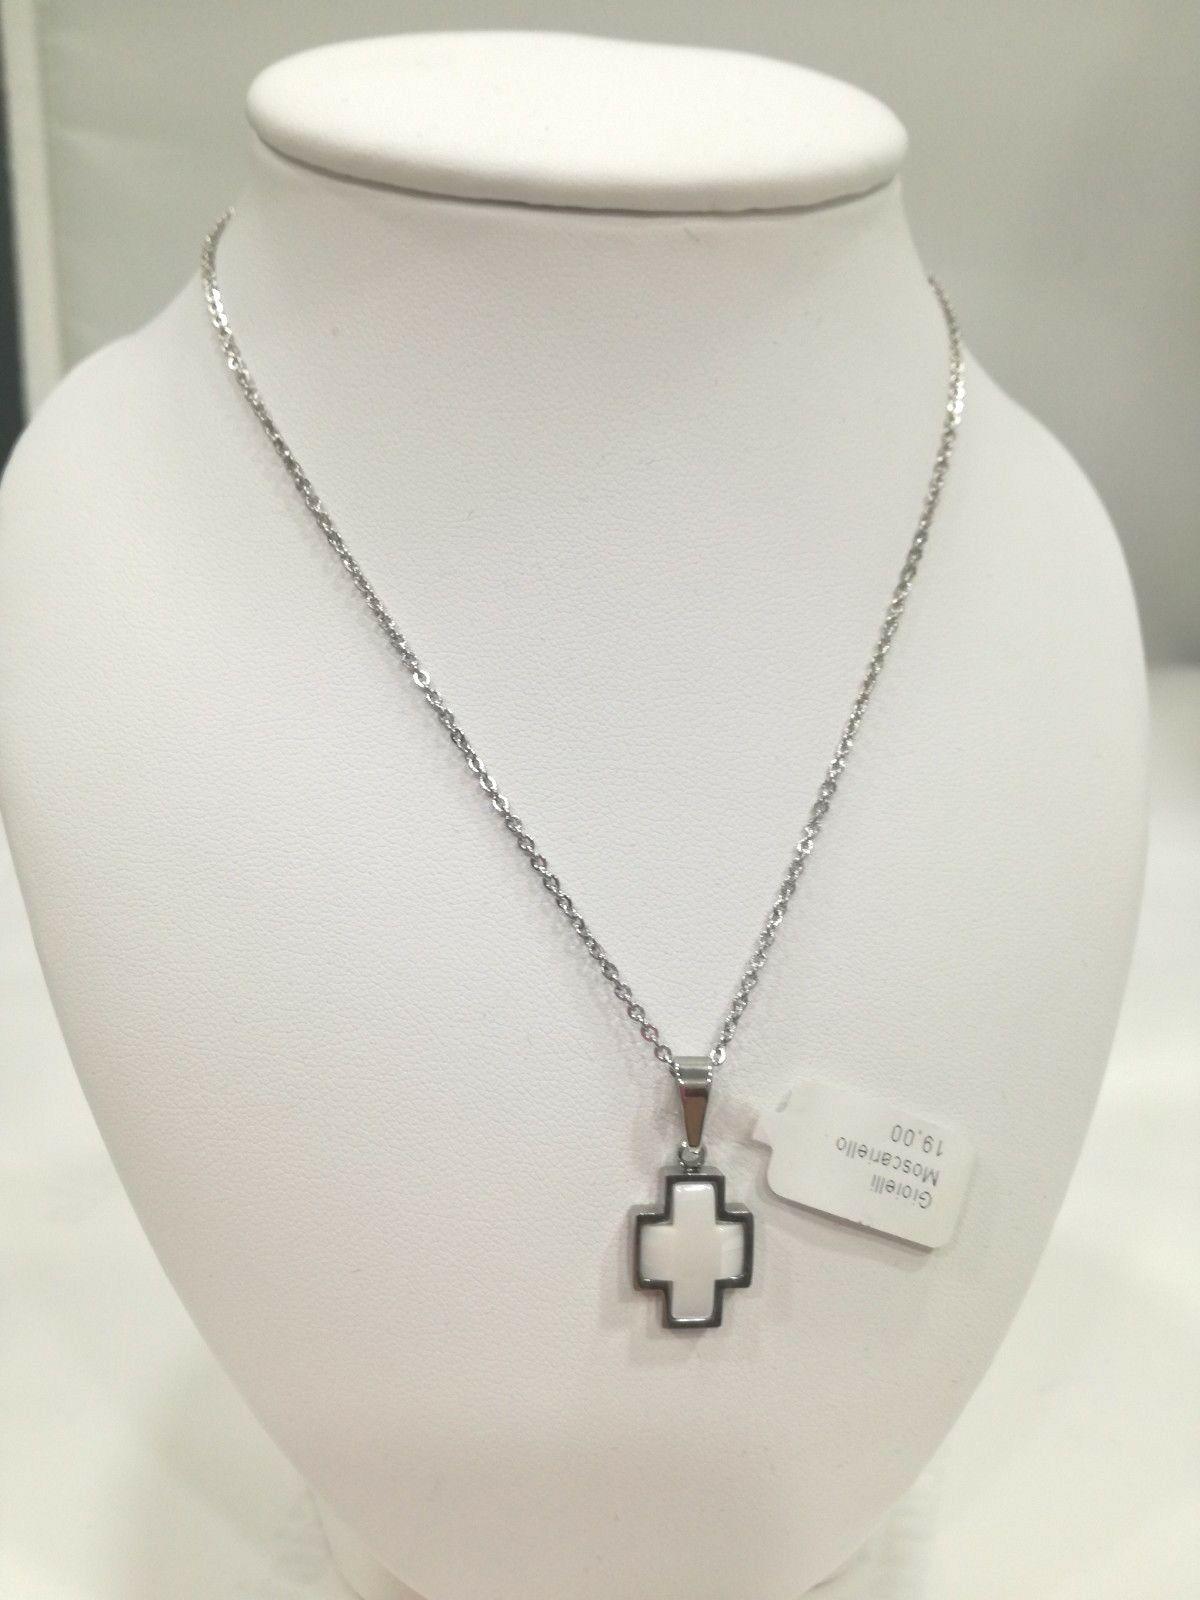 Collana sacra donna Manuel Zed con croce in ceramica Q2310_0004